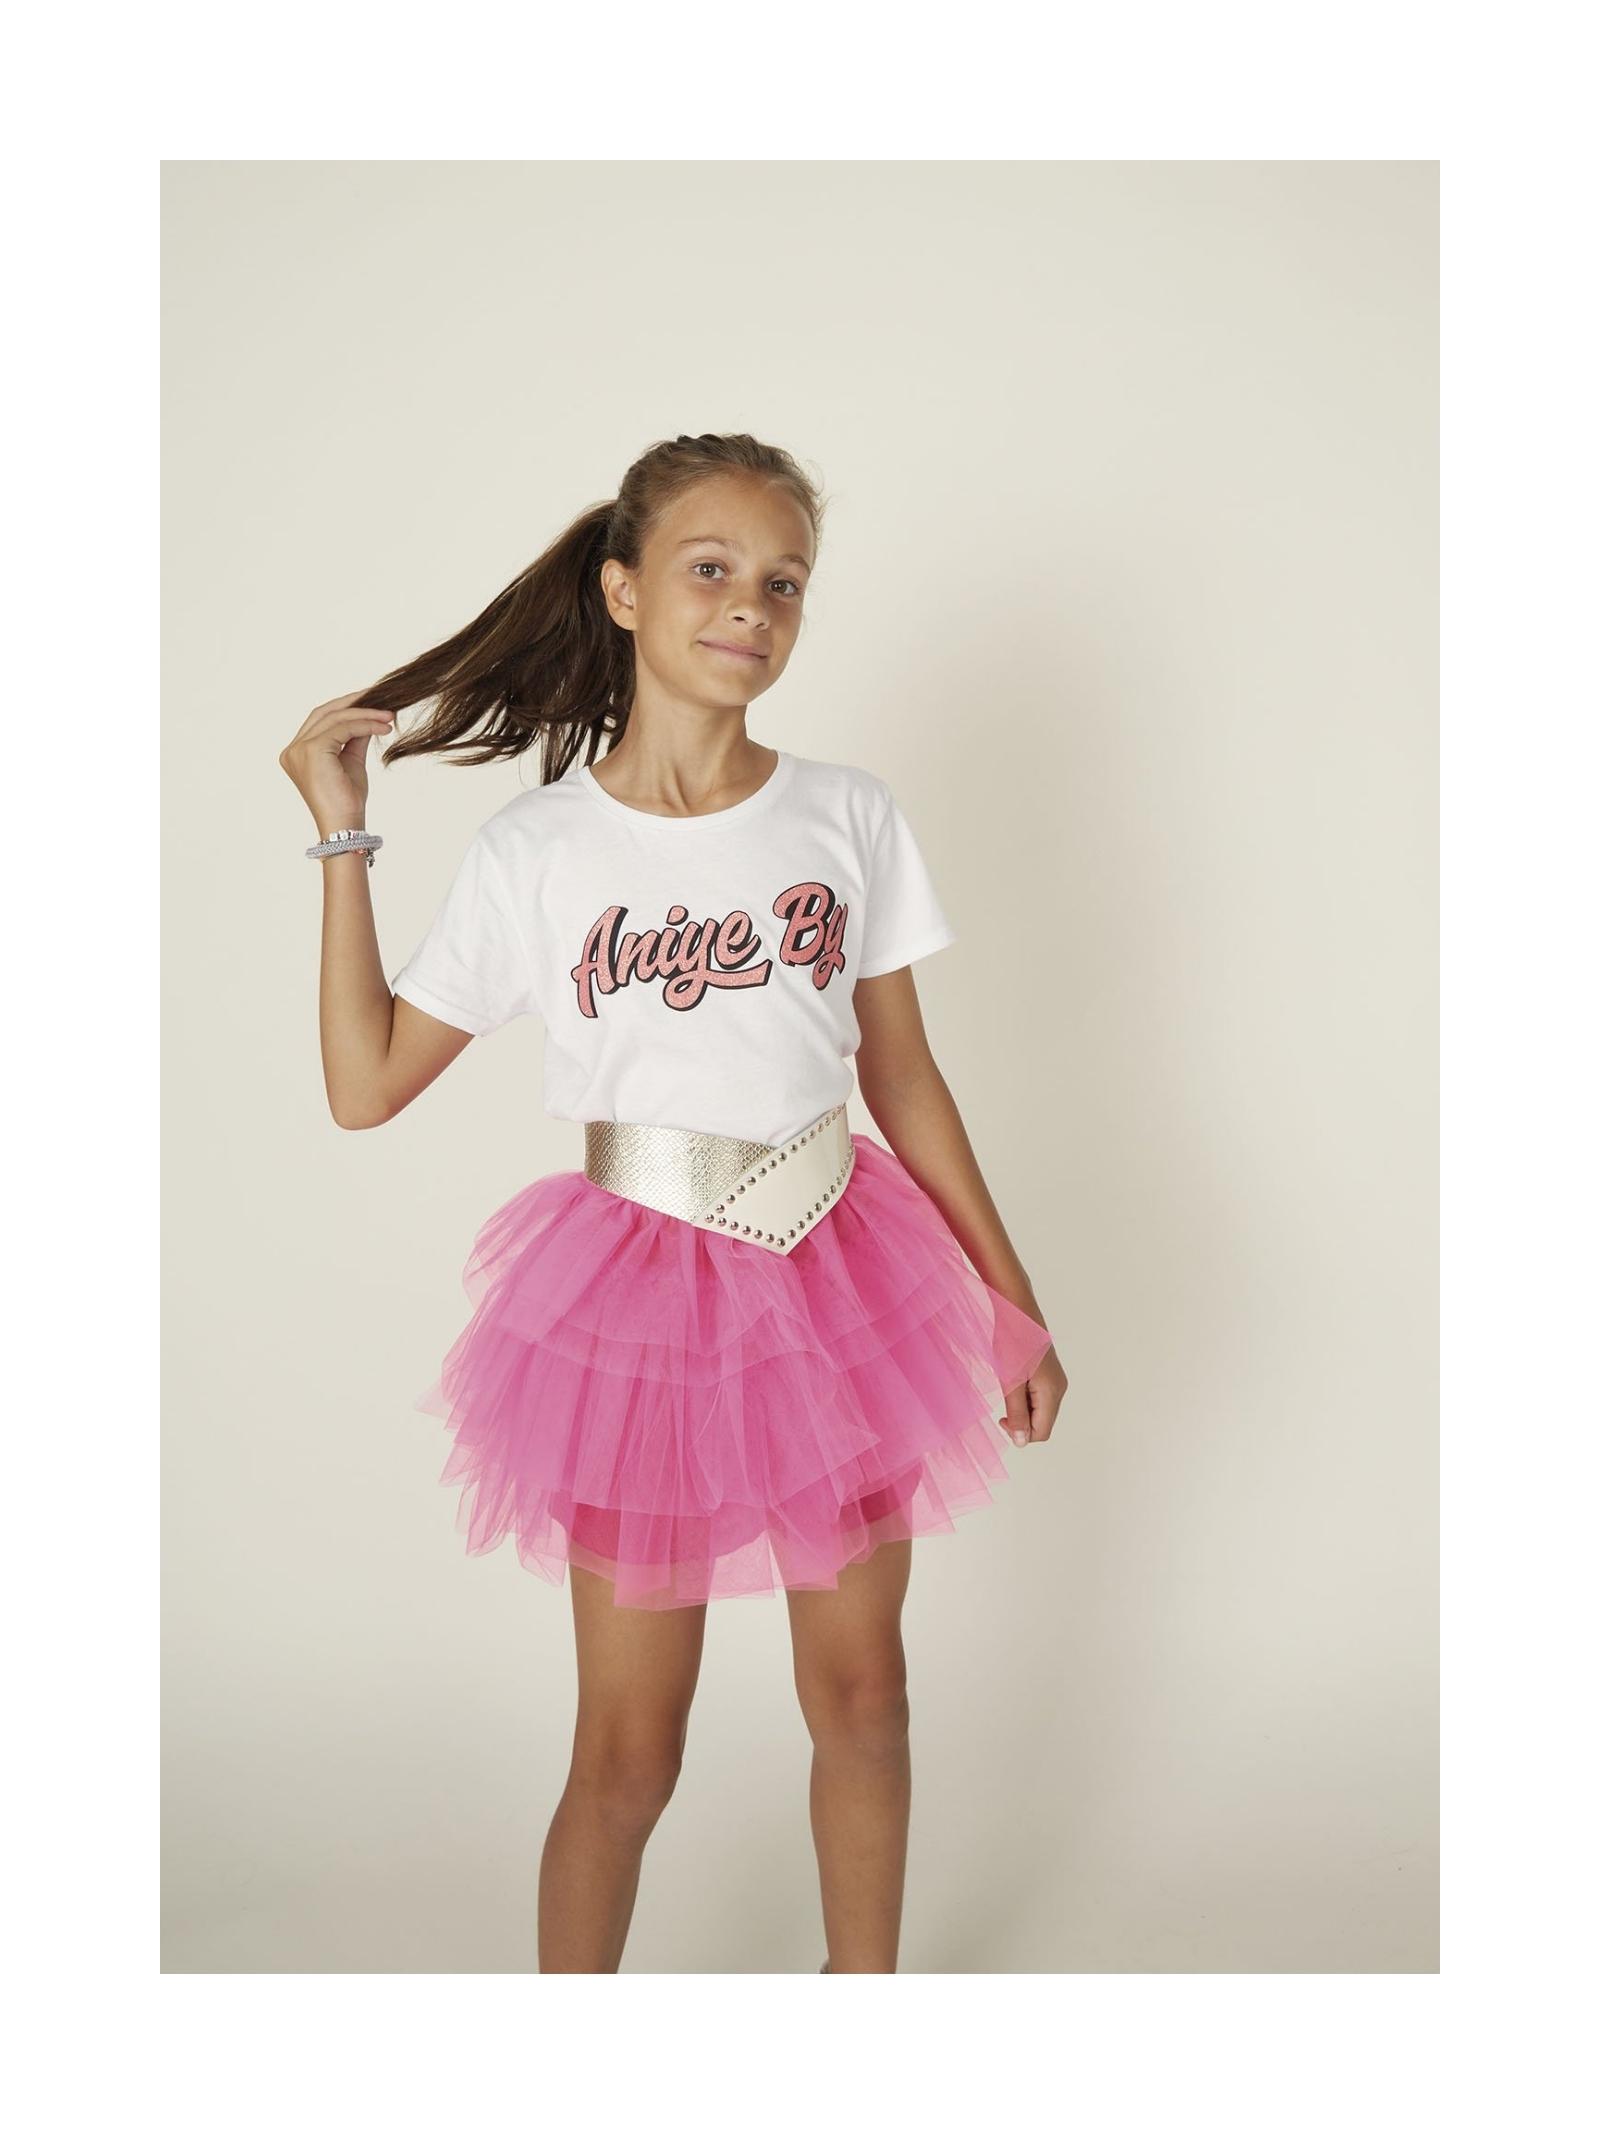 T-Shirt Aniye Maty ANIYE BY GIRL | T-shirt | 11503100680